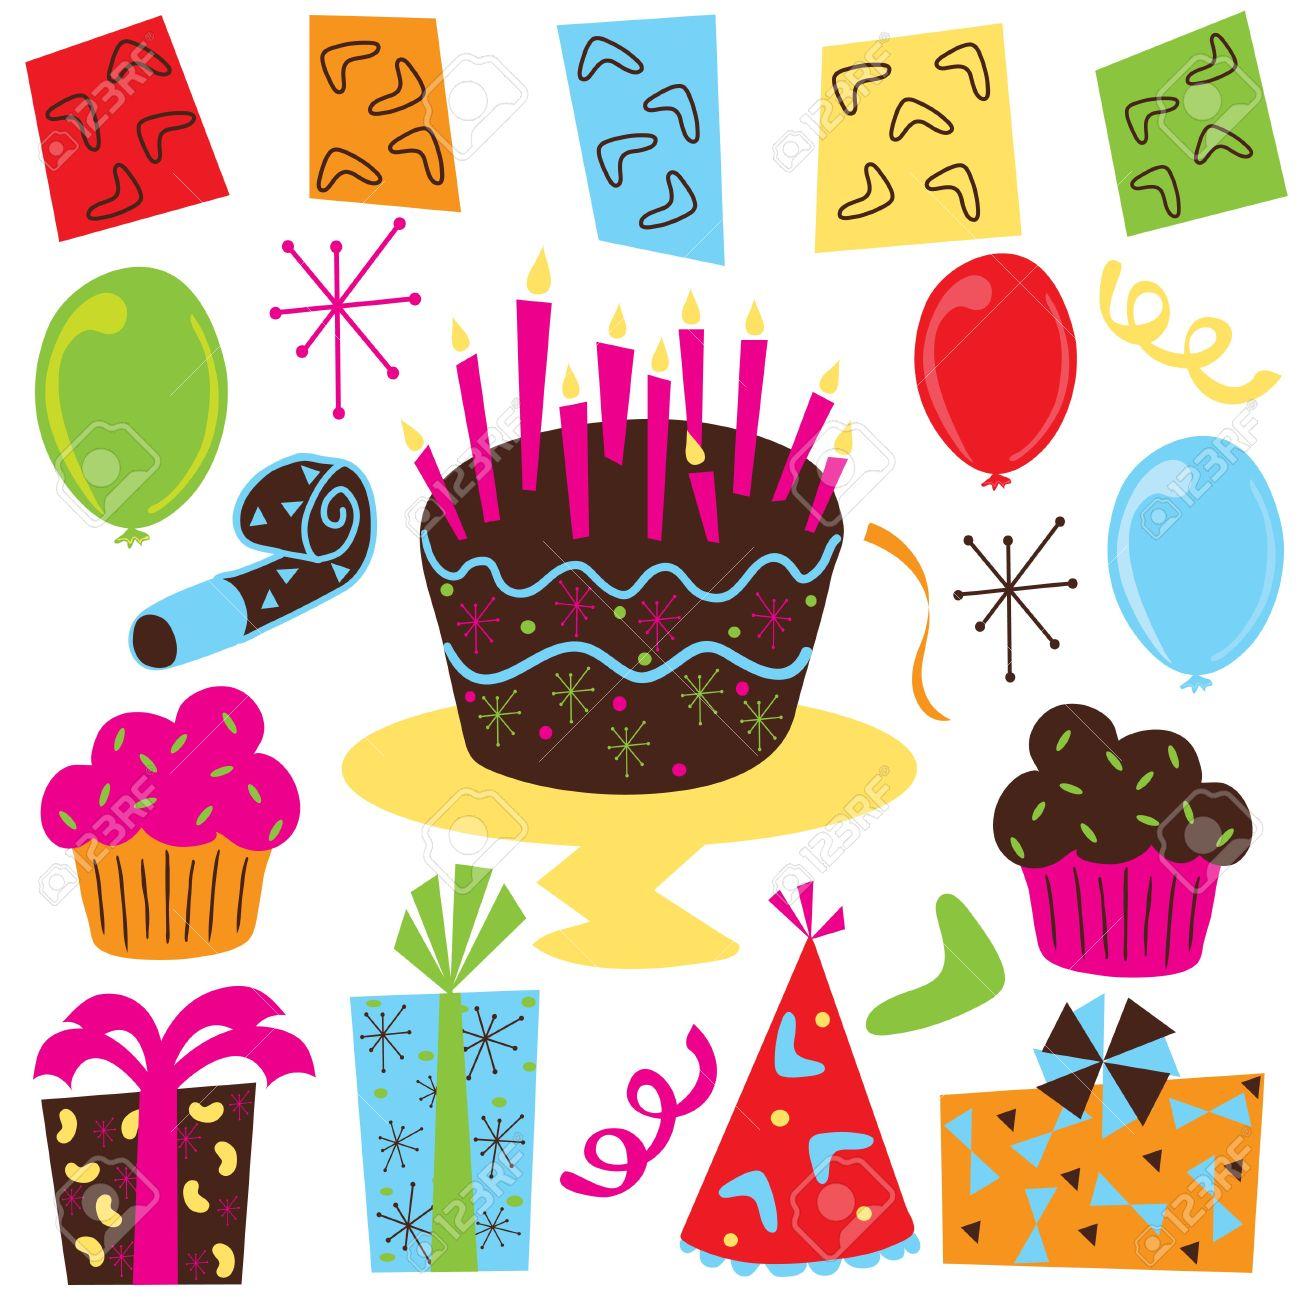 Clipart luftballon geburtstag png freeuse Retro Party Geburtstag Clipart Geburtstag Mit Kuchen, Cupcakes ... png freeuse